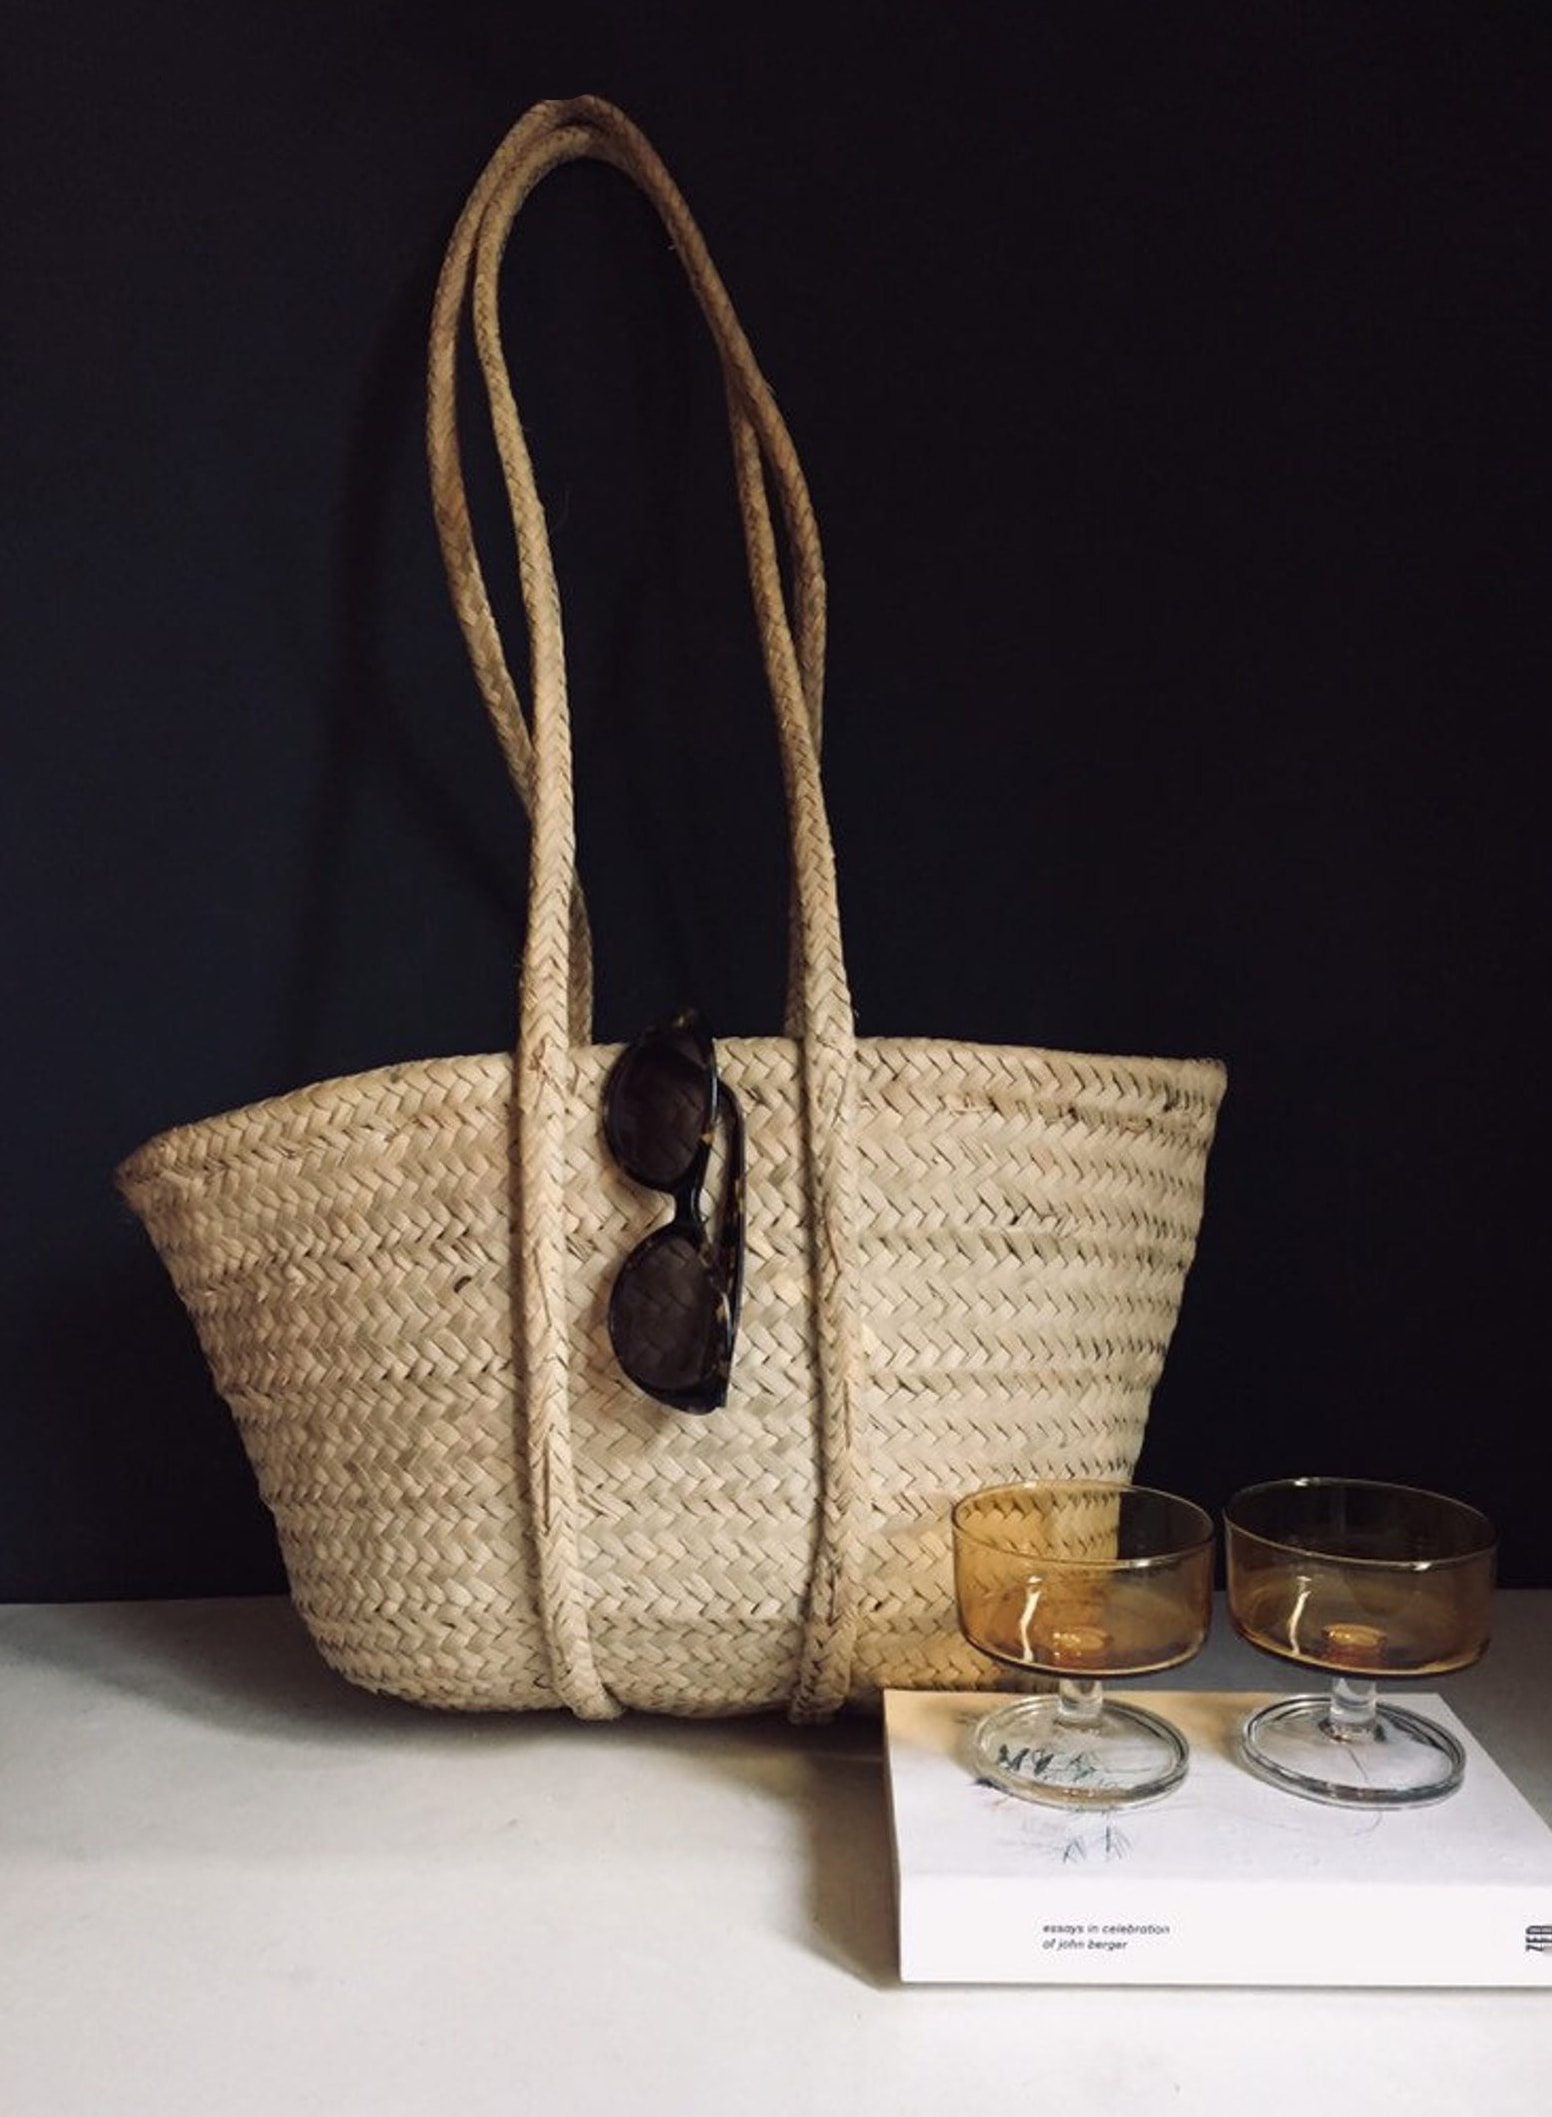 Vintage hand woven shopper basket